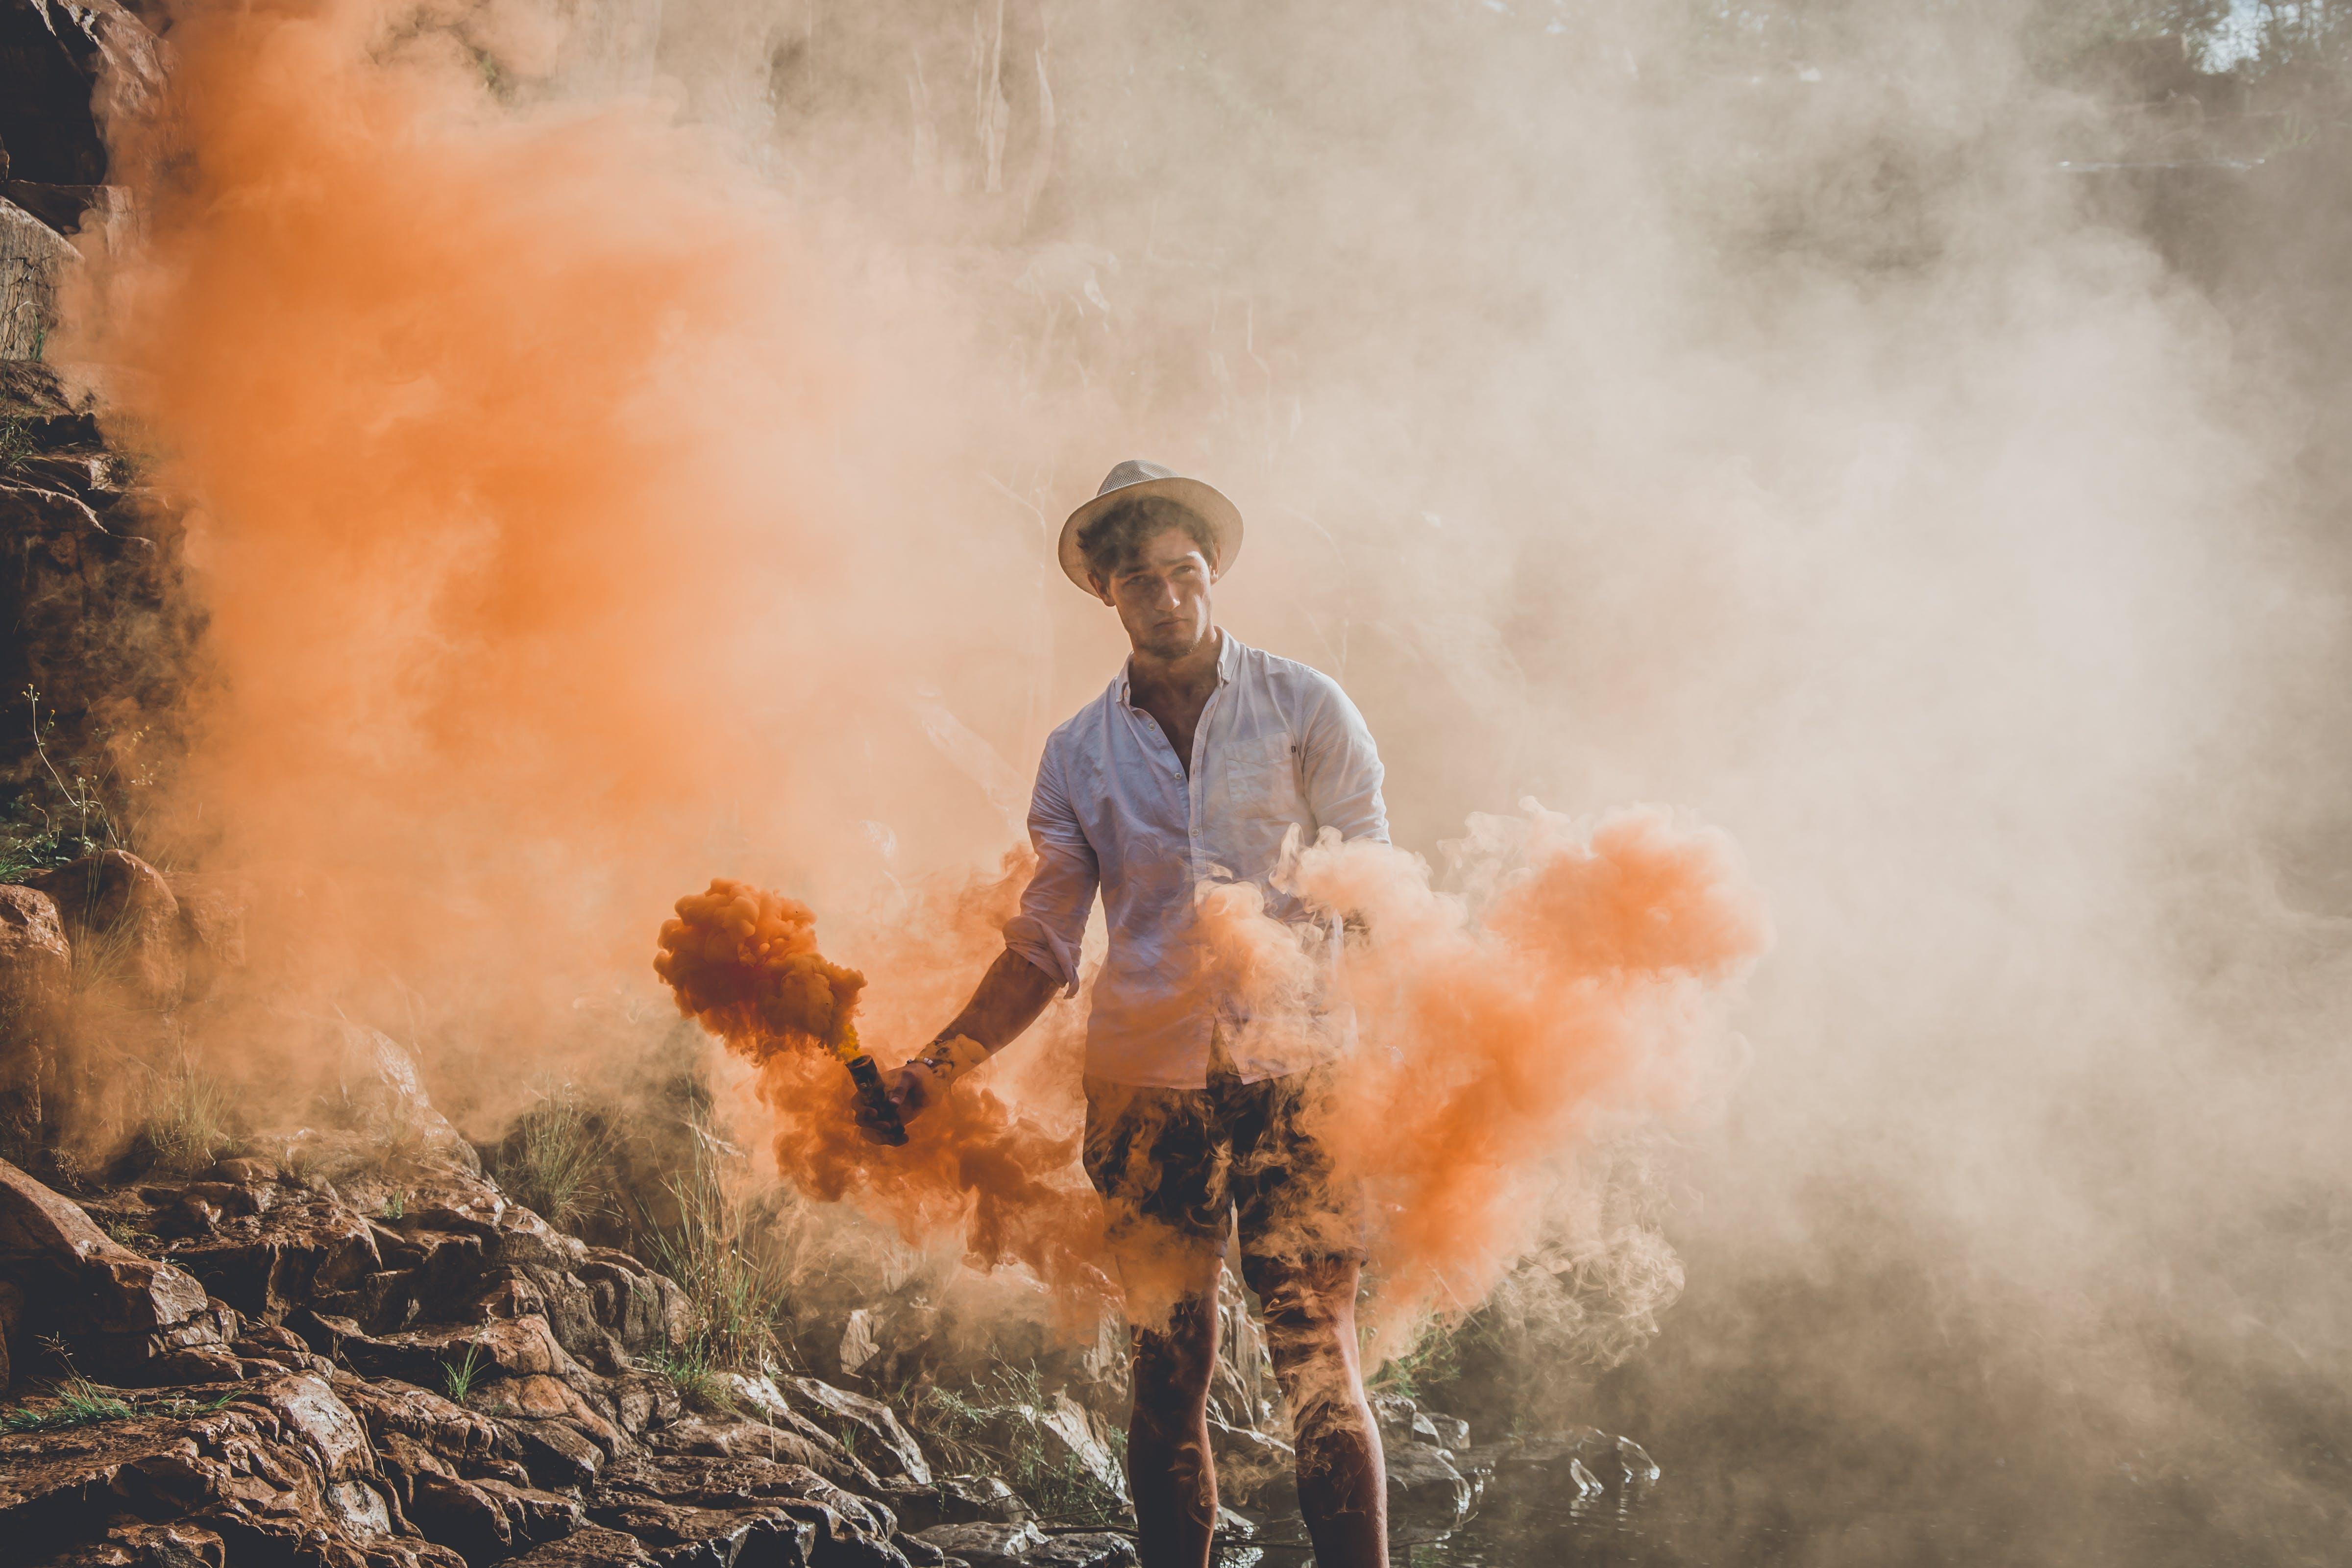 Man Standing While Holding Smoke Grenades